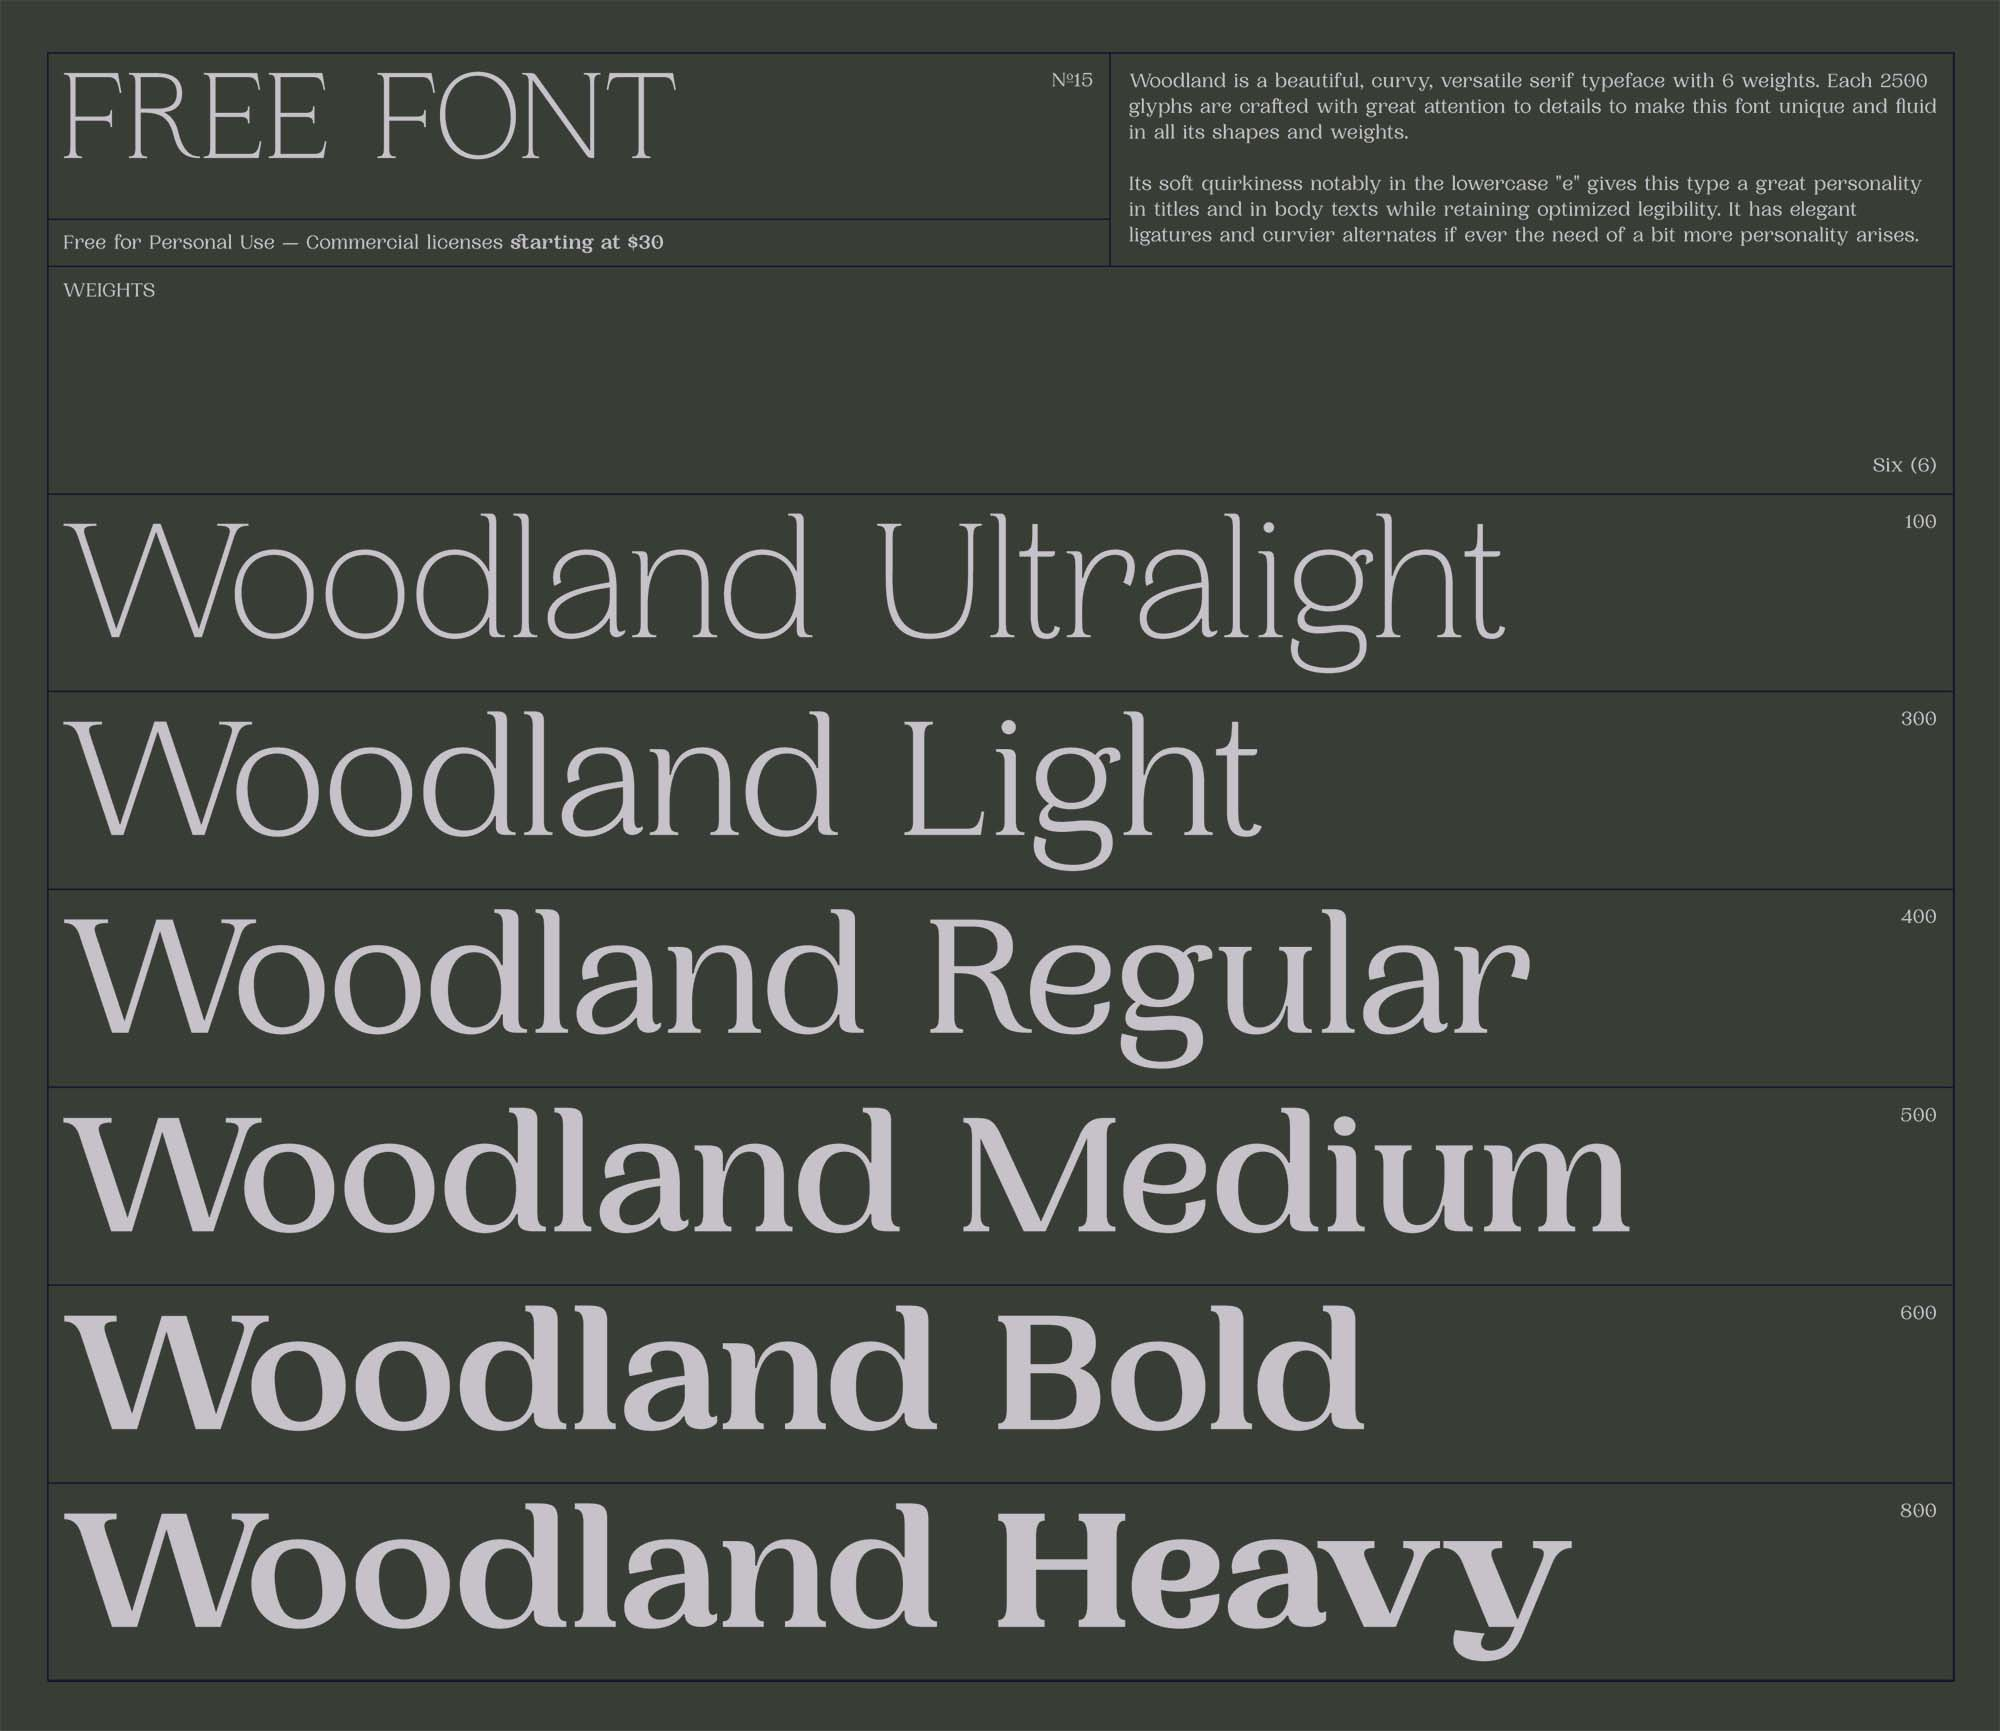 Woodland Serif Typeface Weights